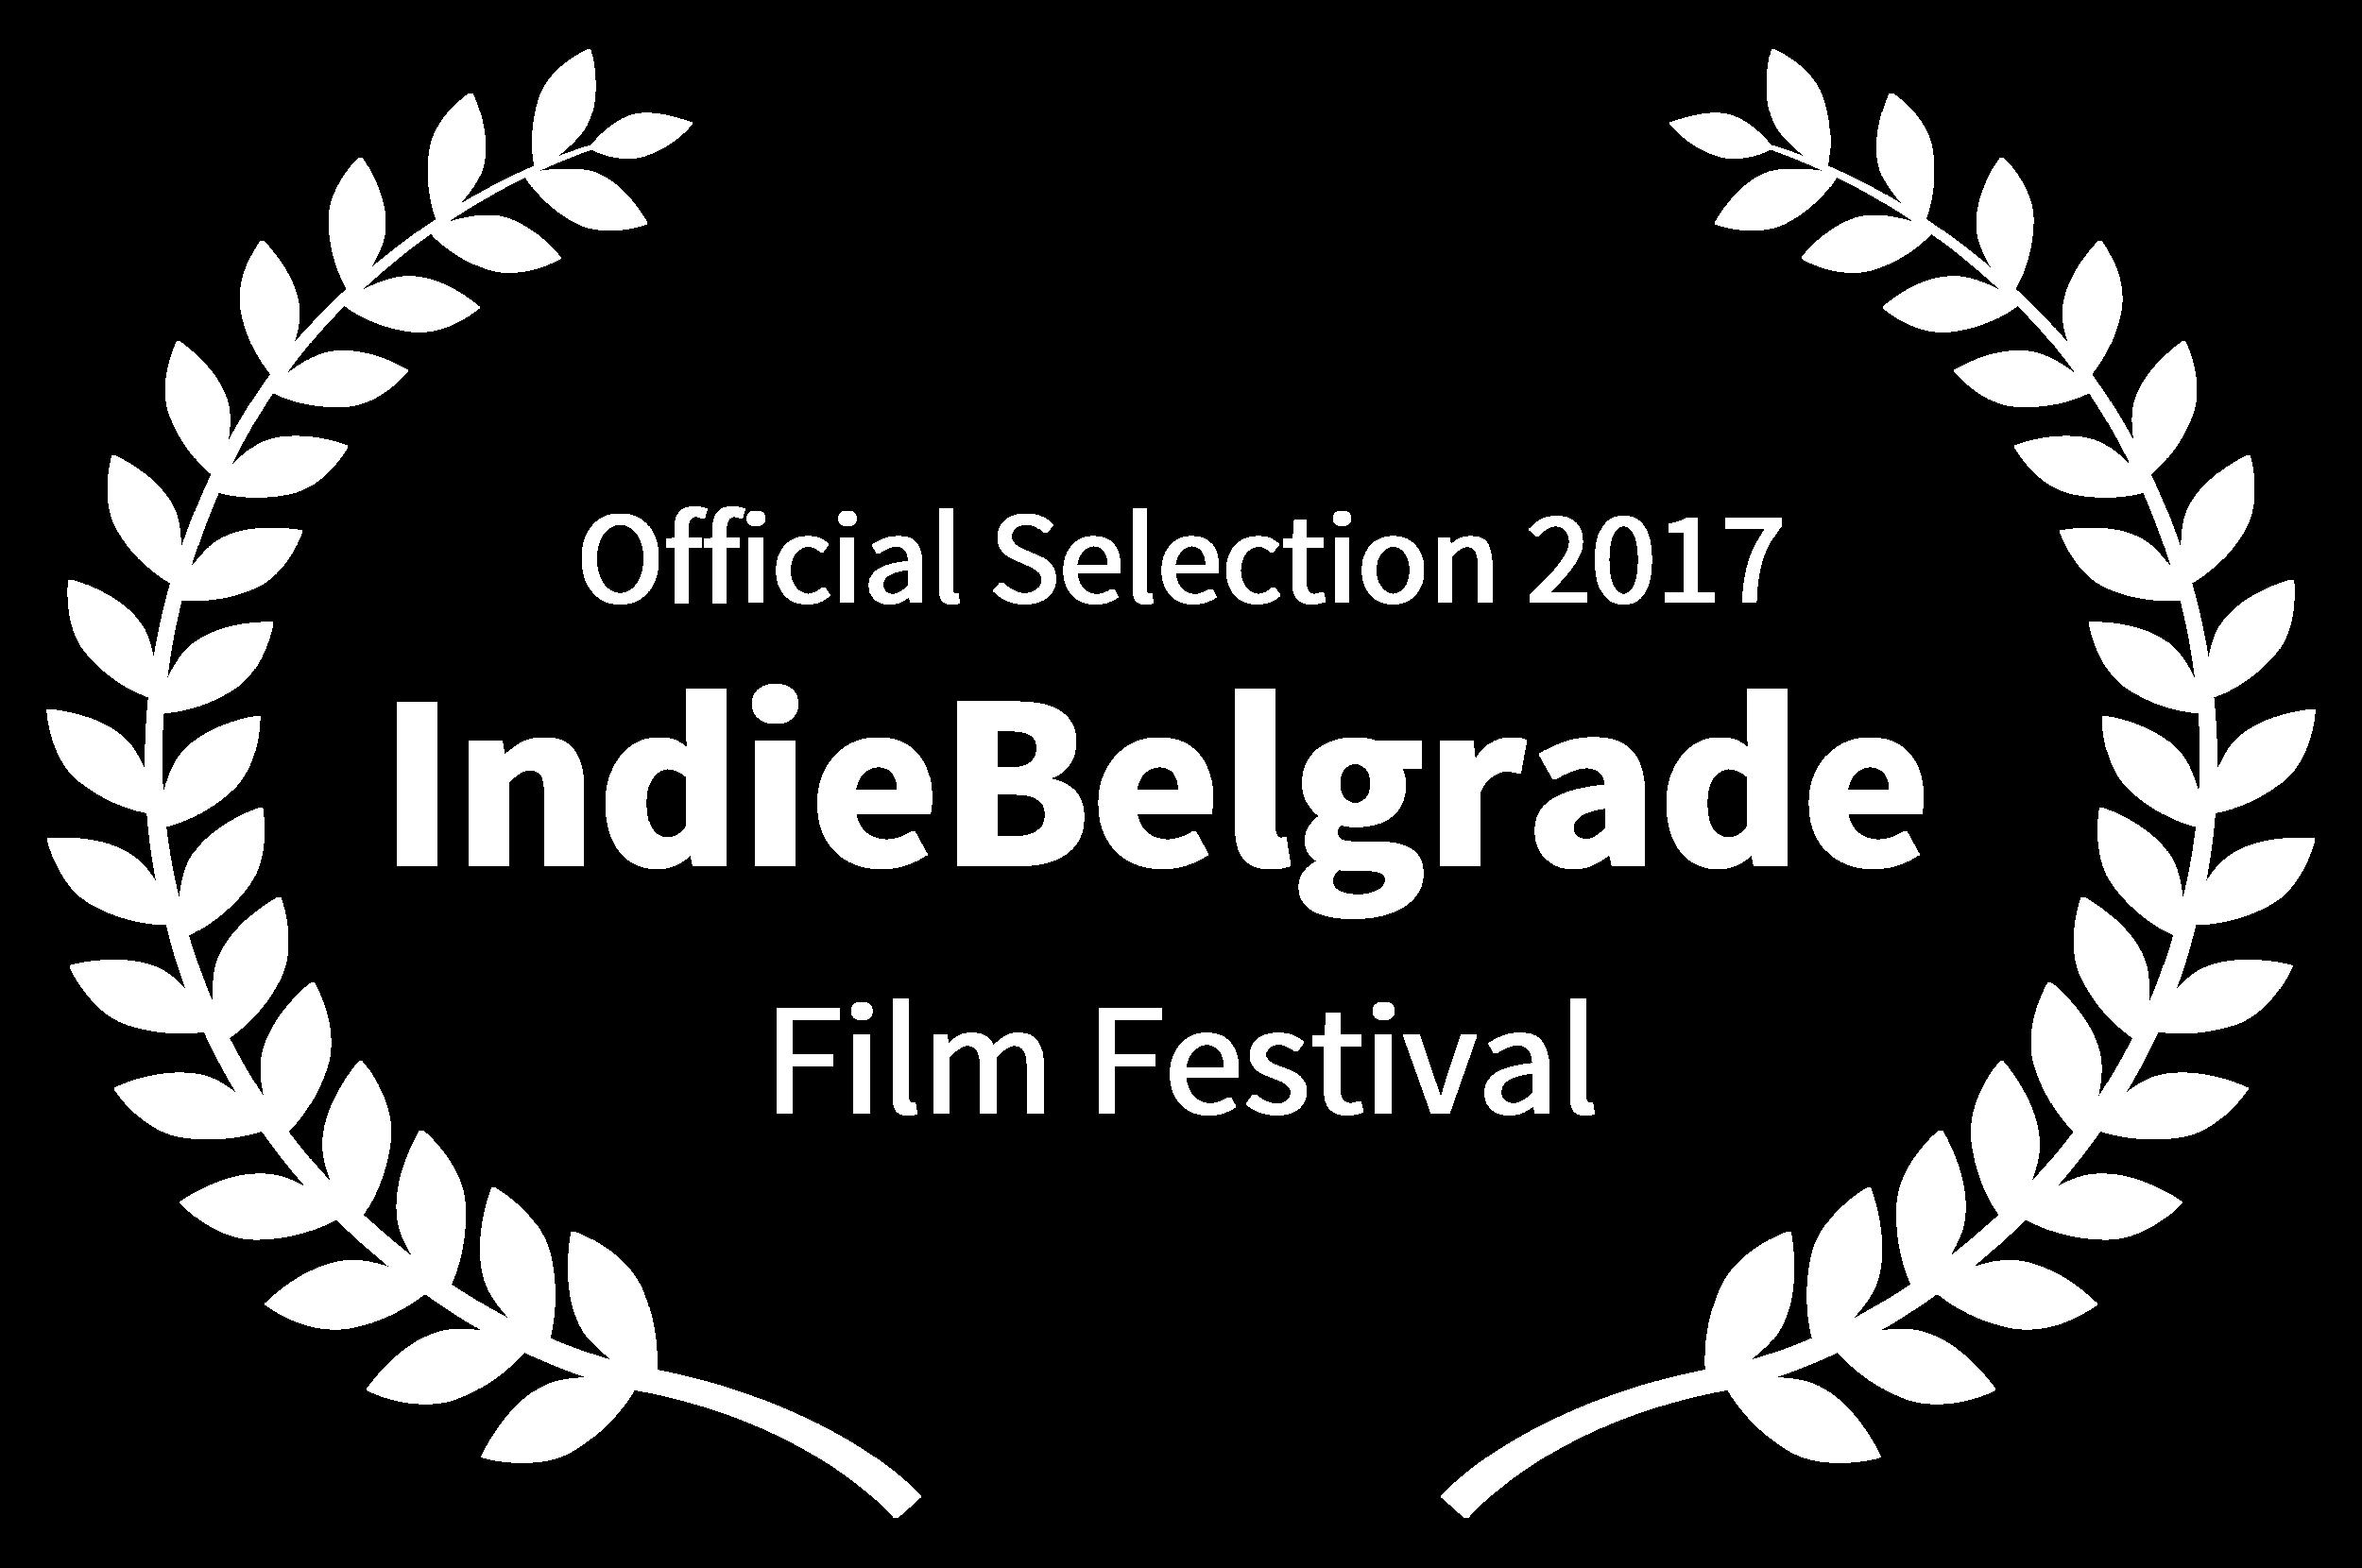 Laurels 2017-IndieBelgrade Film Festival.png